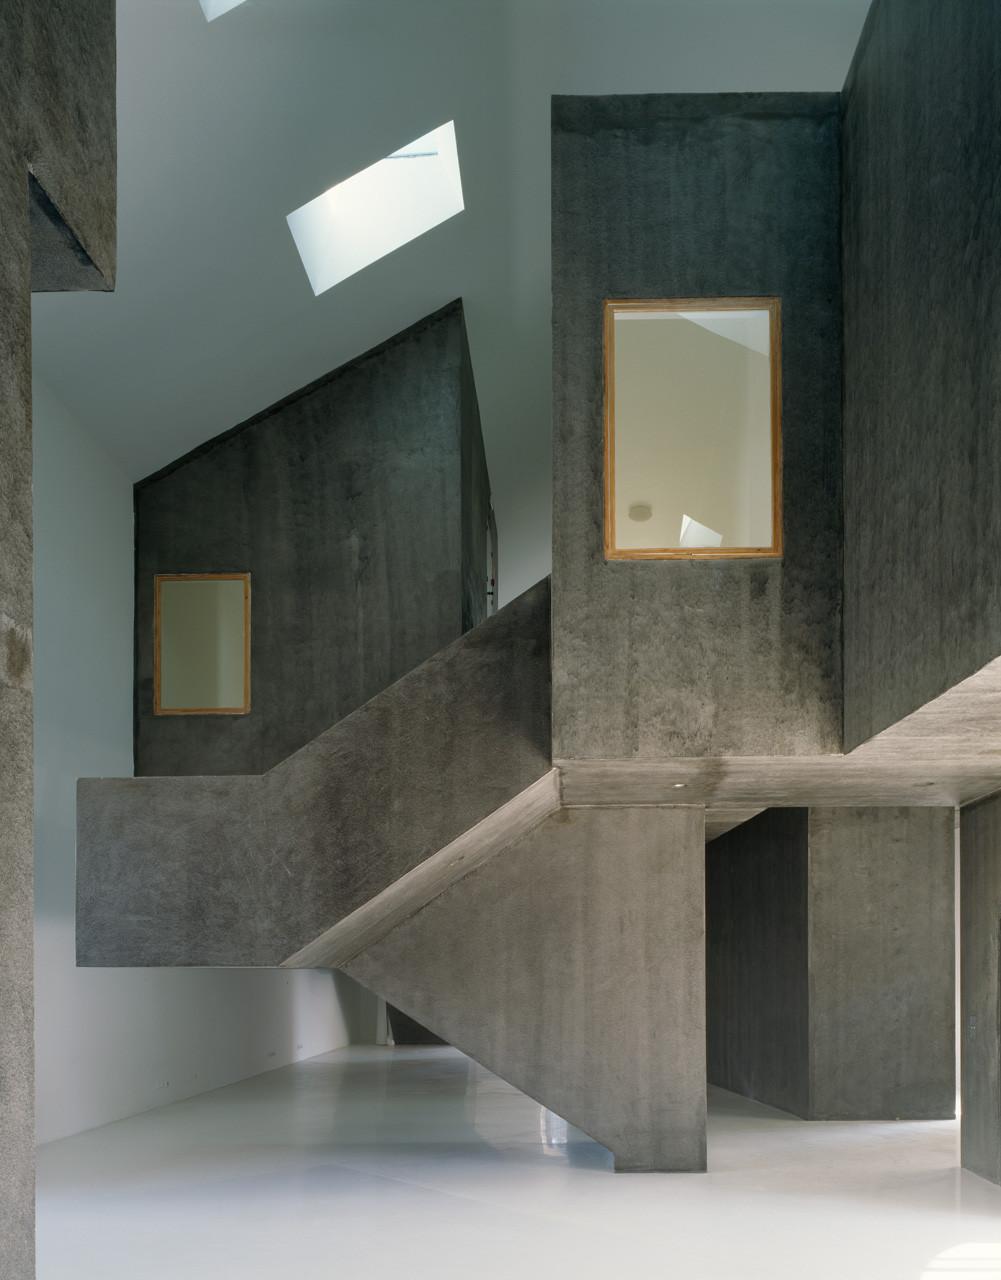 Casa dos Cubos / EMBAIXADA arquitectura, Courtesy of  embaixada arquitectura